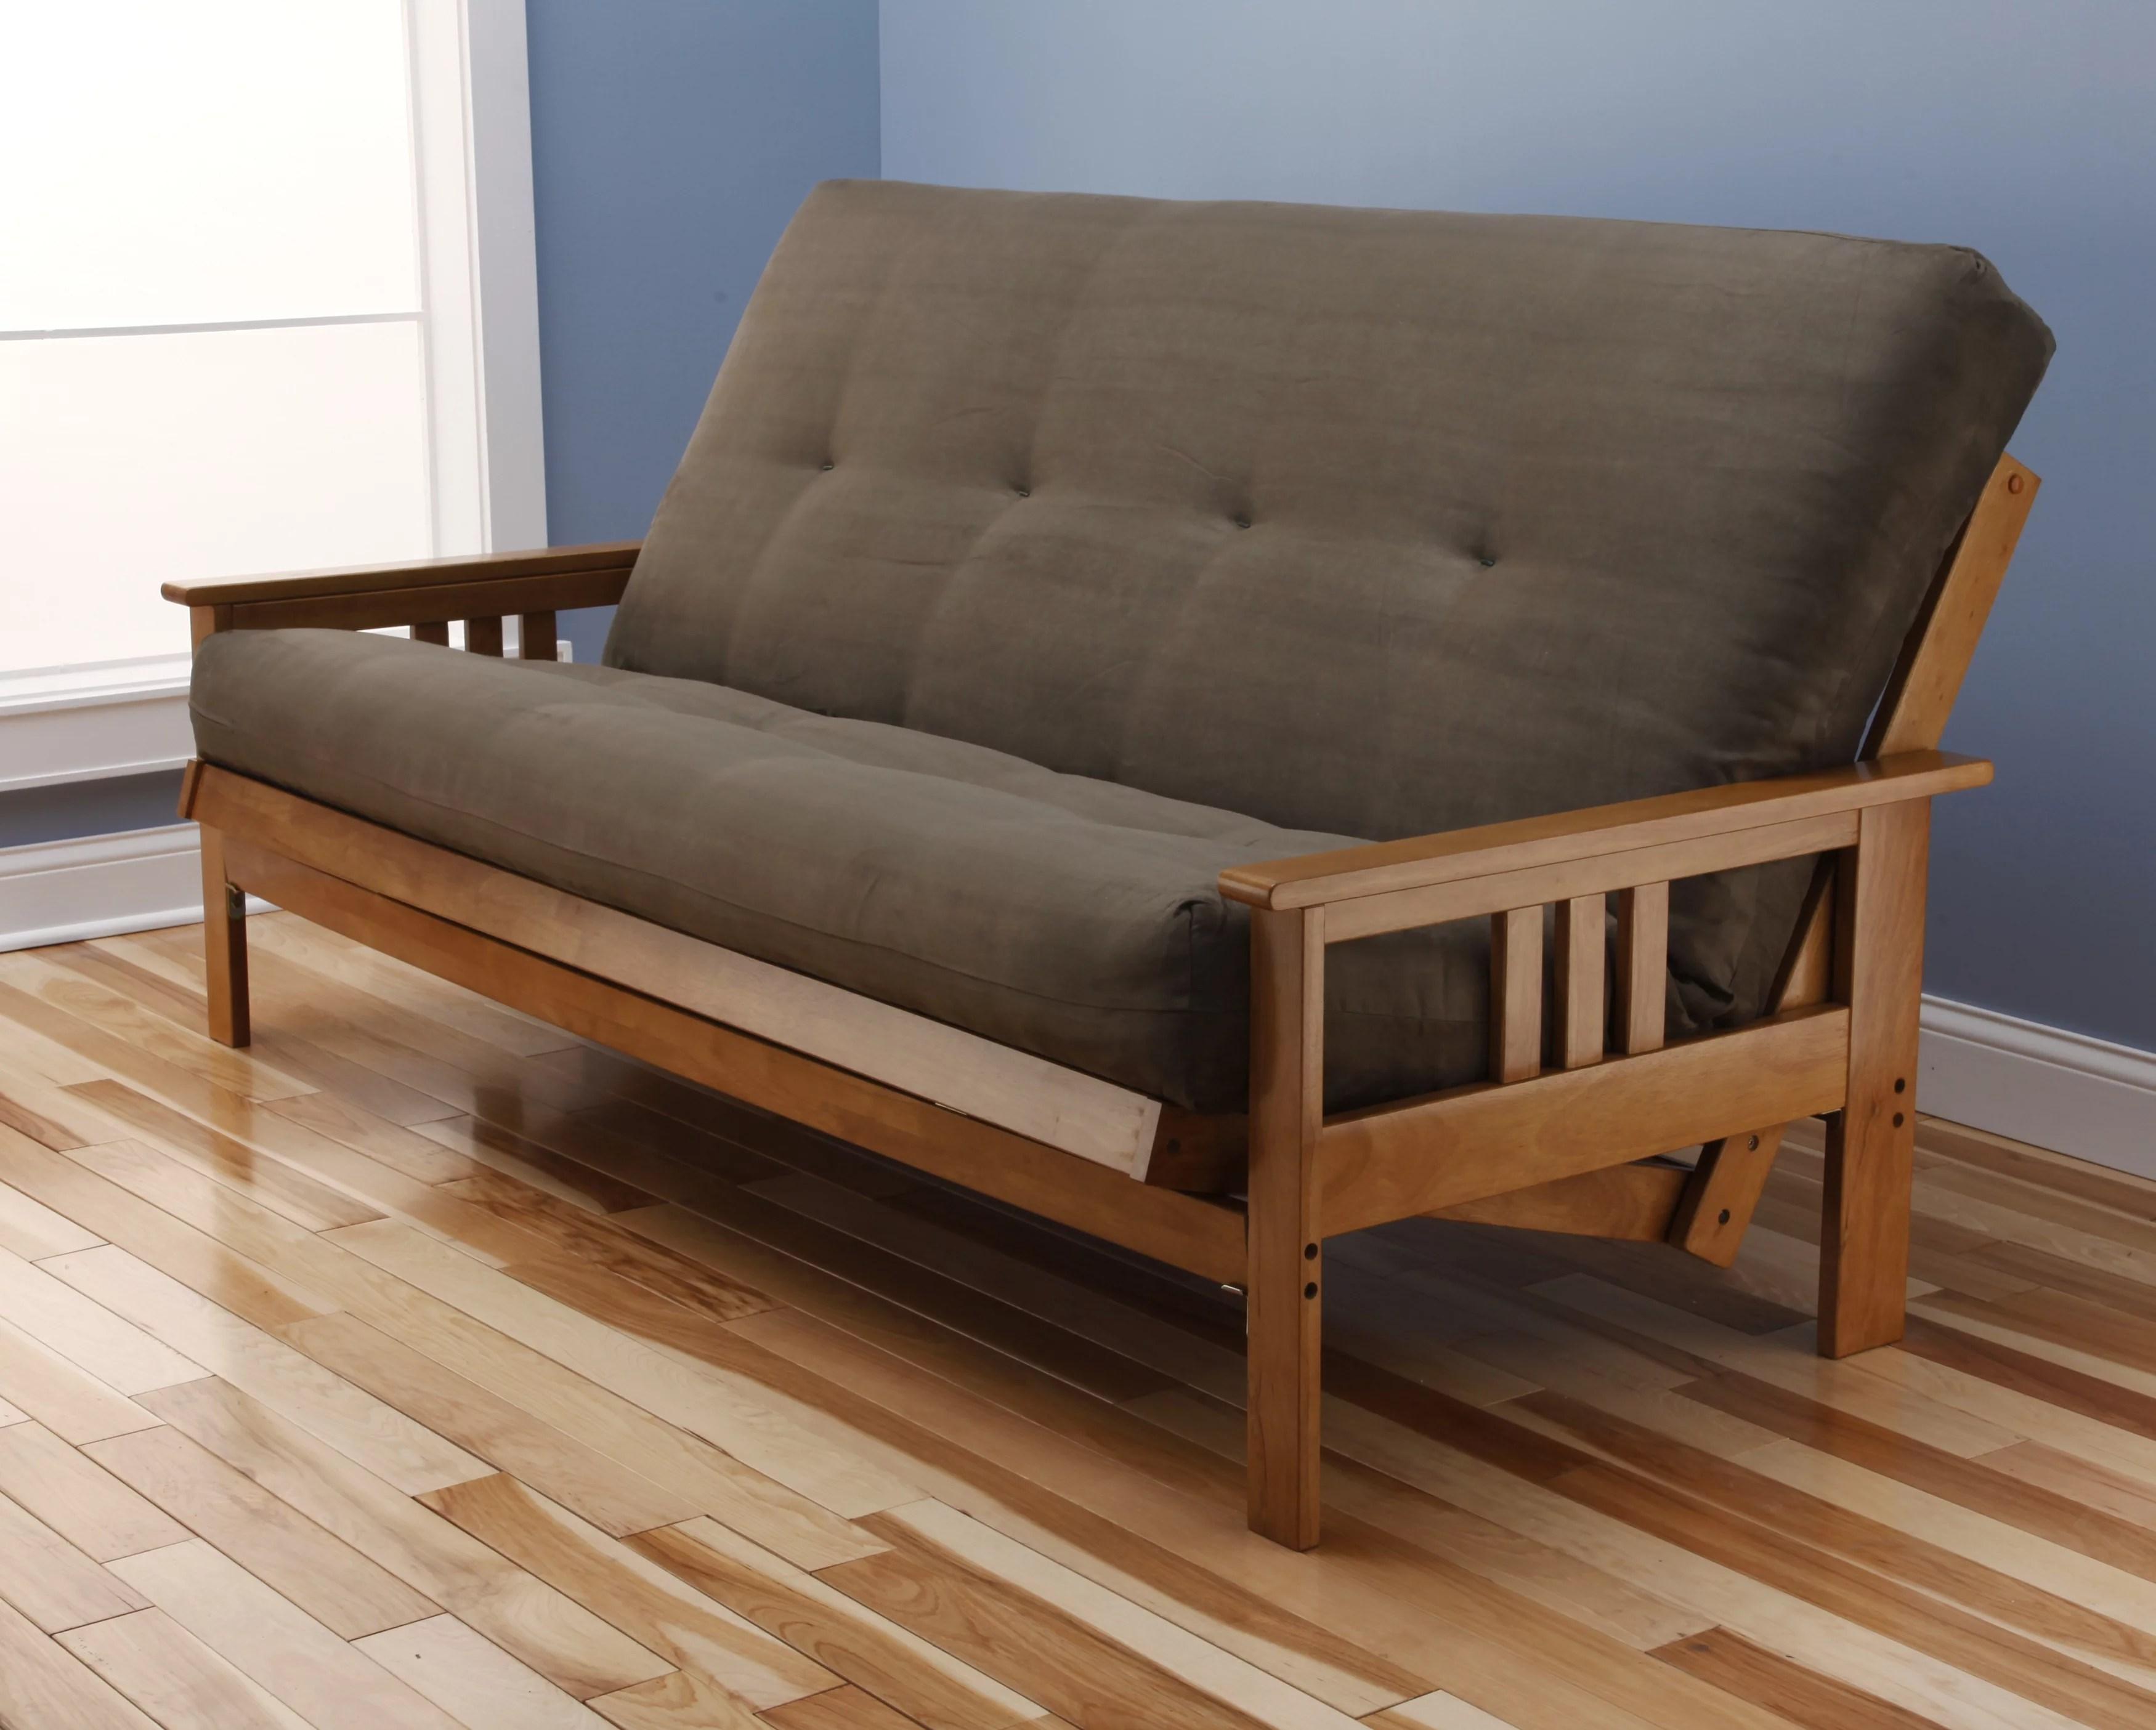 andover full size futon sofa bed honey oak wood frame suede innerspring mattress walmart com